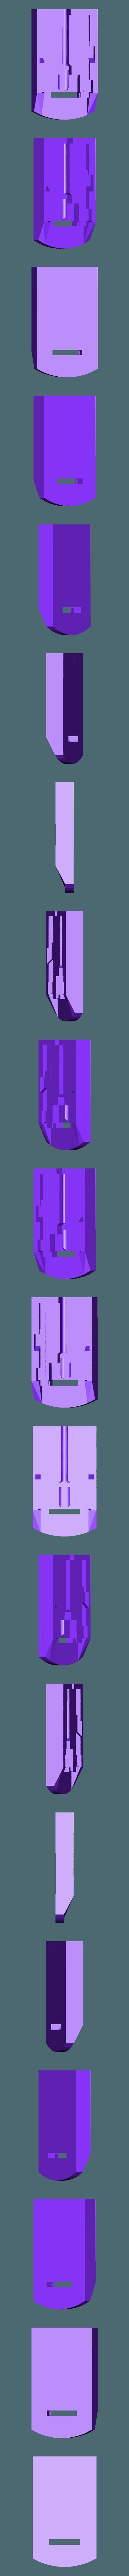 cradle_B.stl Download free STL file DJI Spark Battery cradle for Universal USB Charger Converter • 3D print model, mwilmars